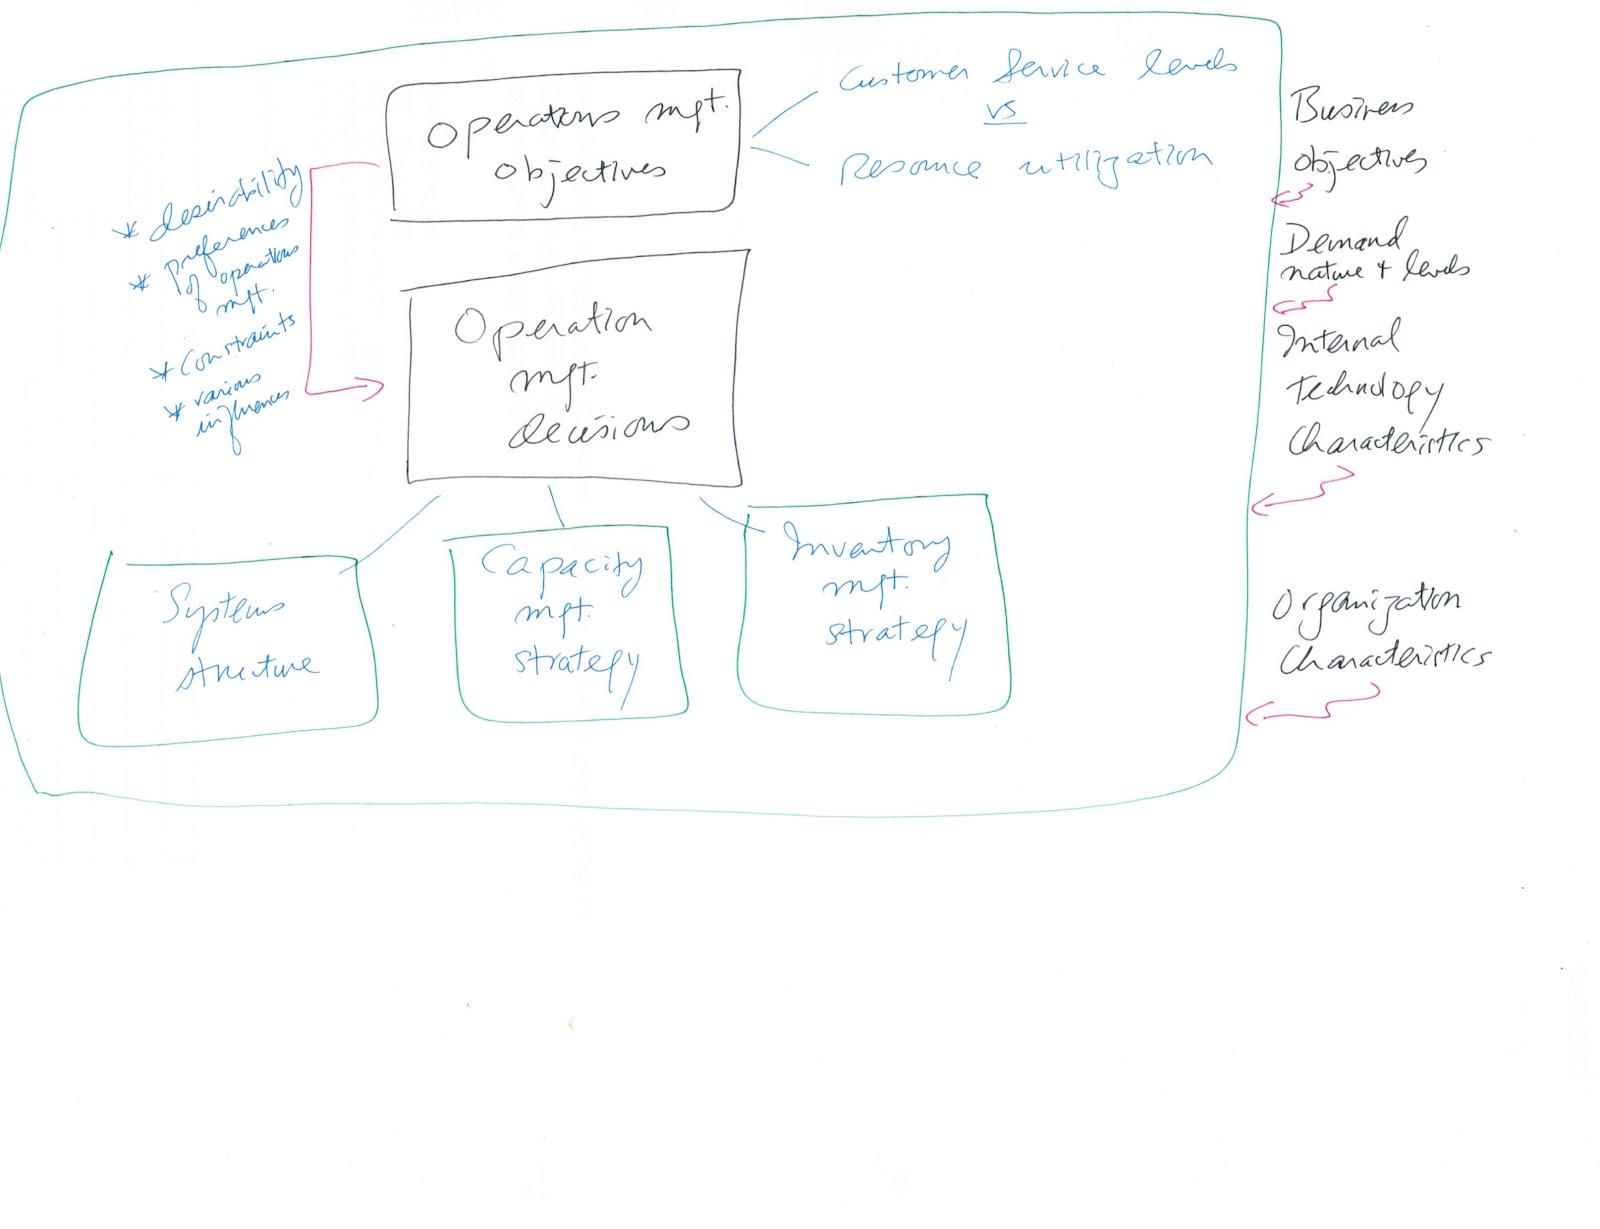 Joseph KK Ho e-resources: Operations Management framework